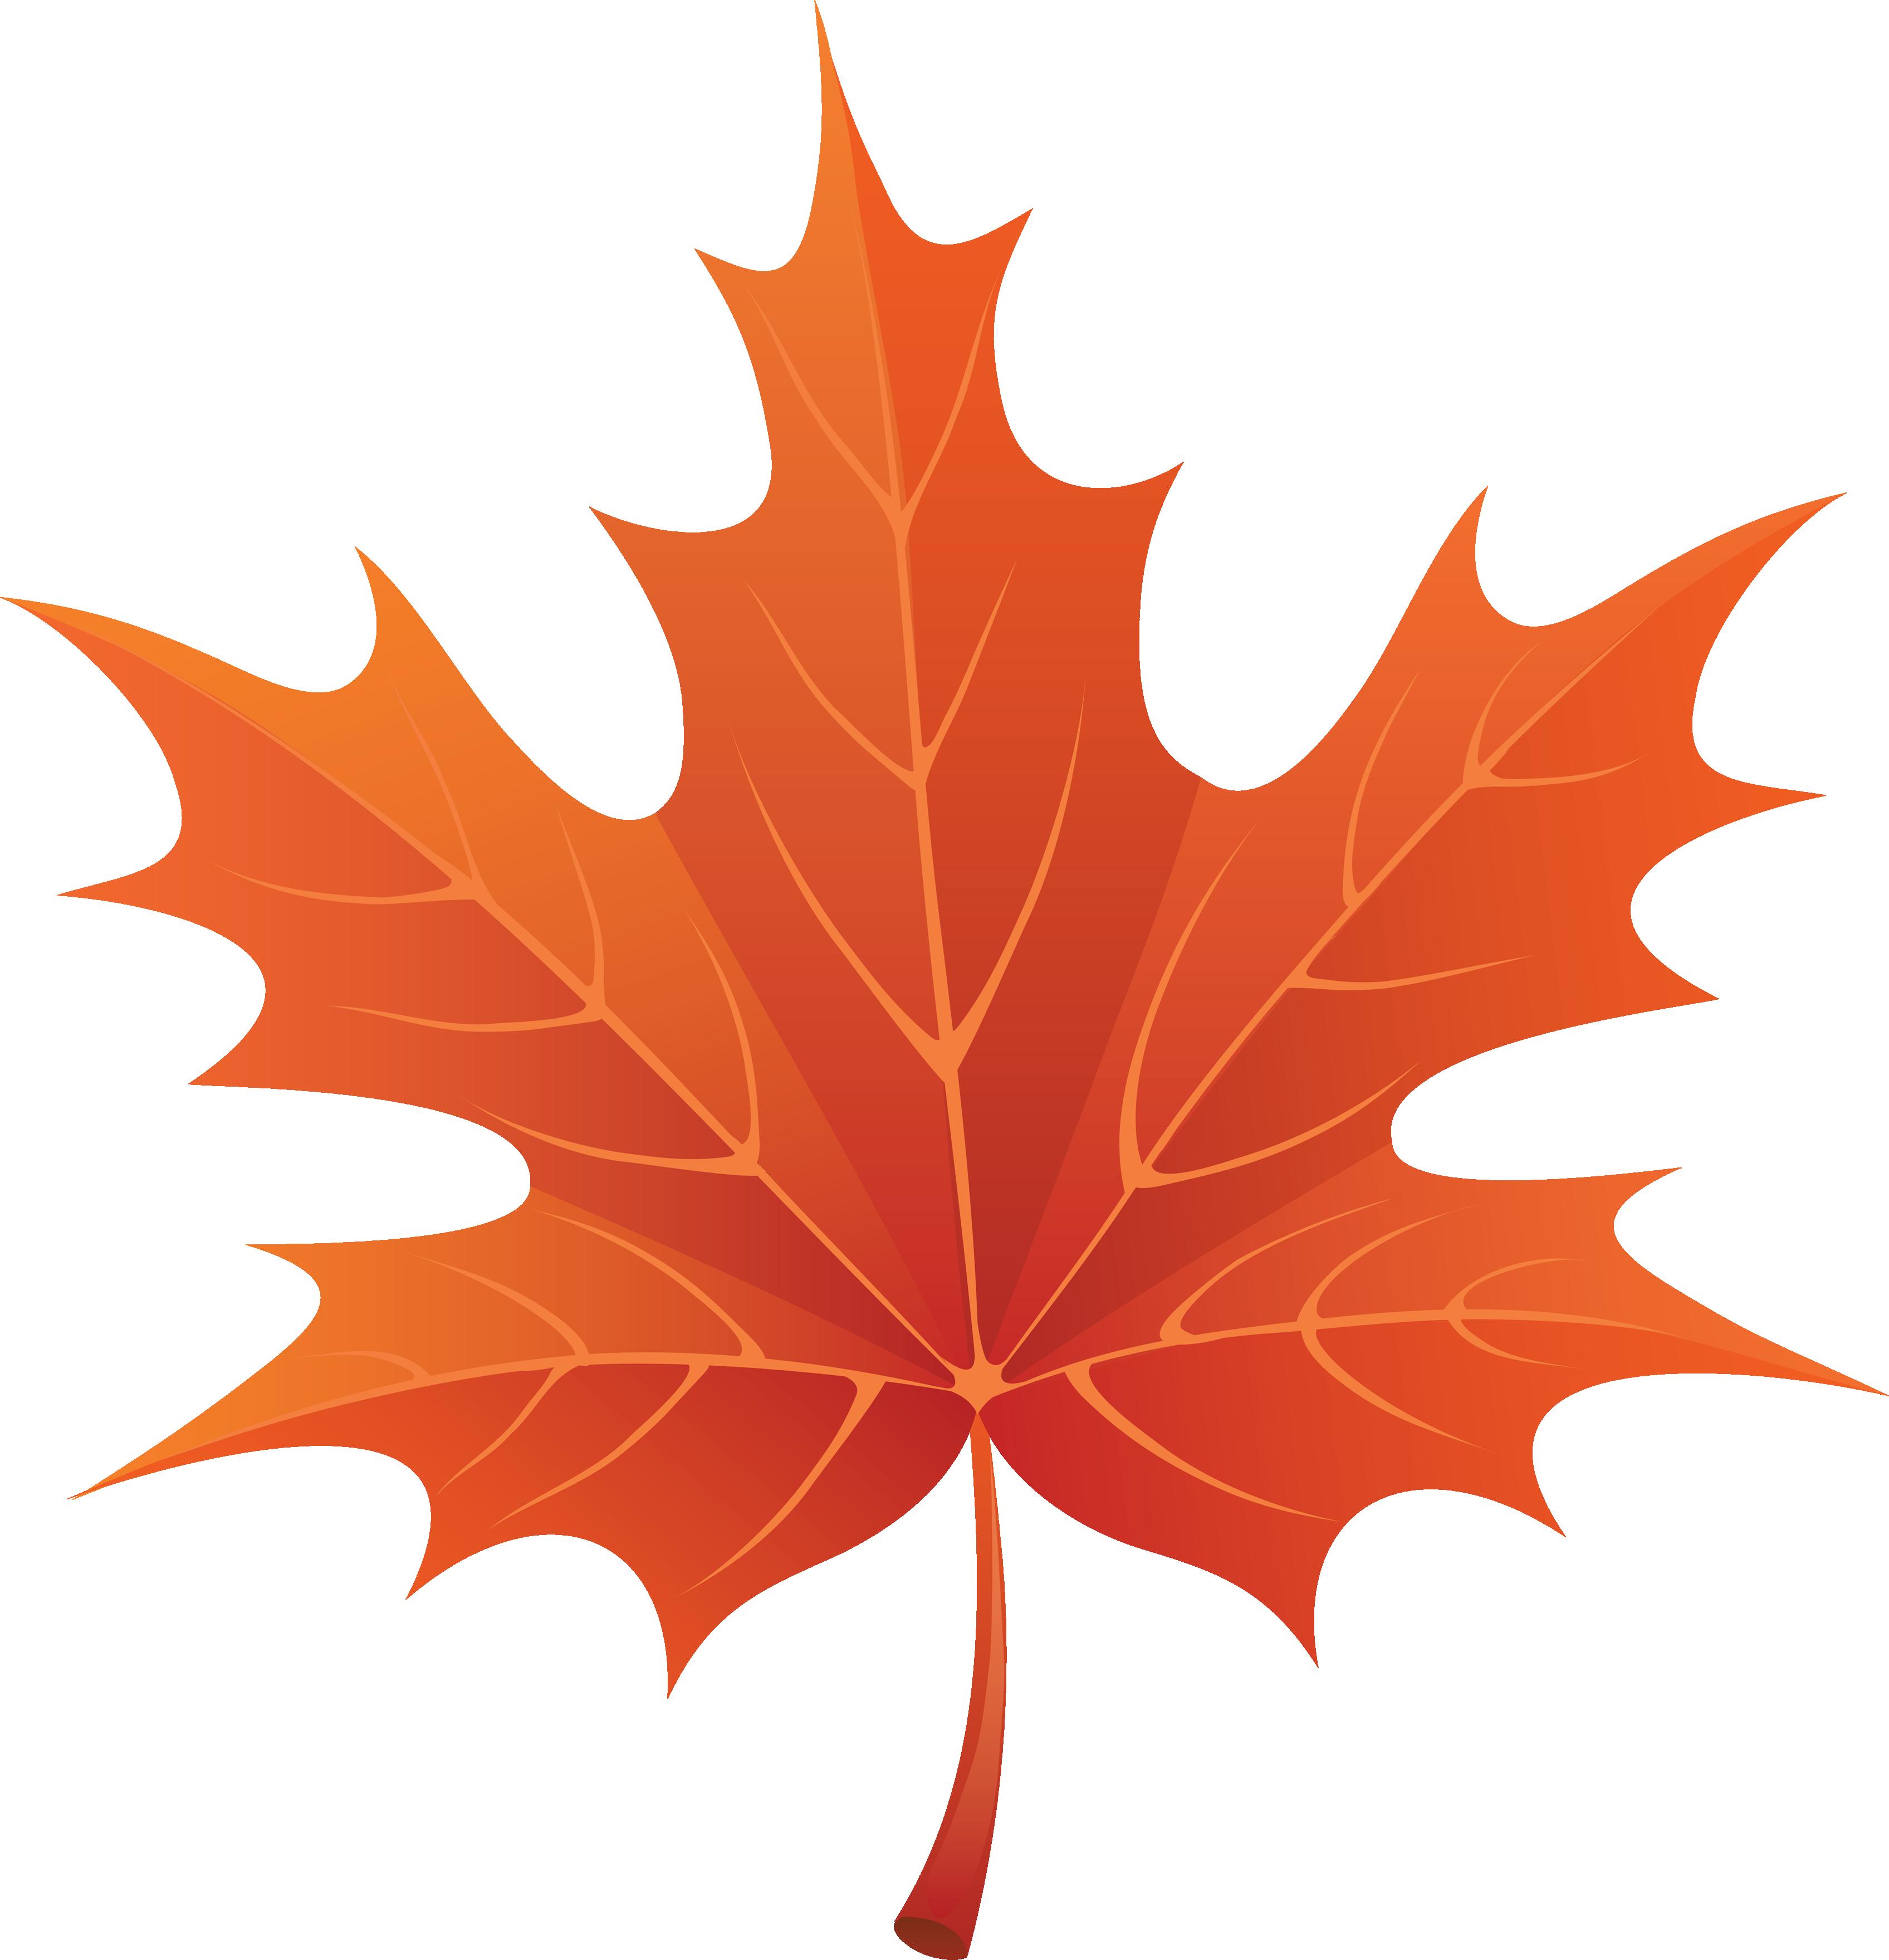 Leaves clipart autumn leaves Leaf Leaf clipart #7 Download